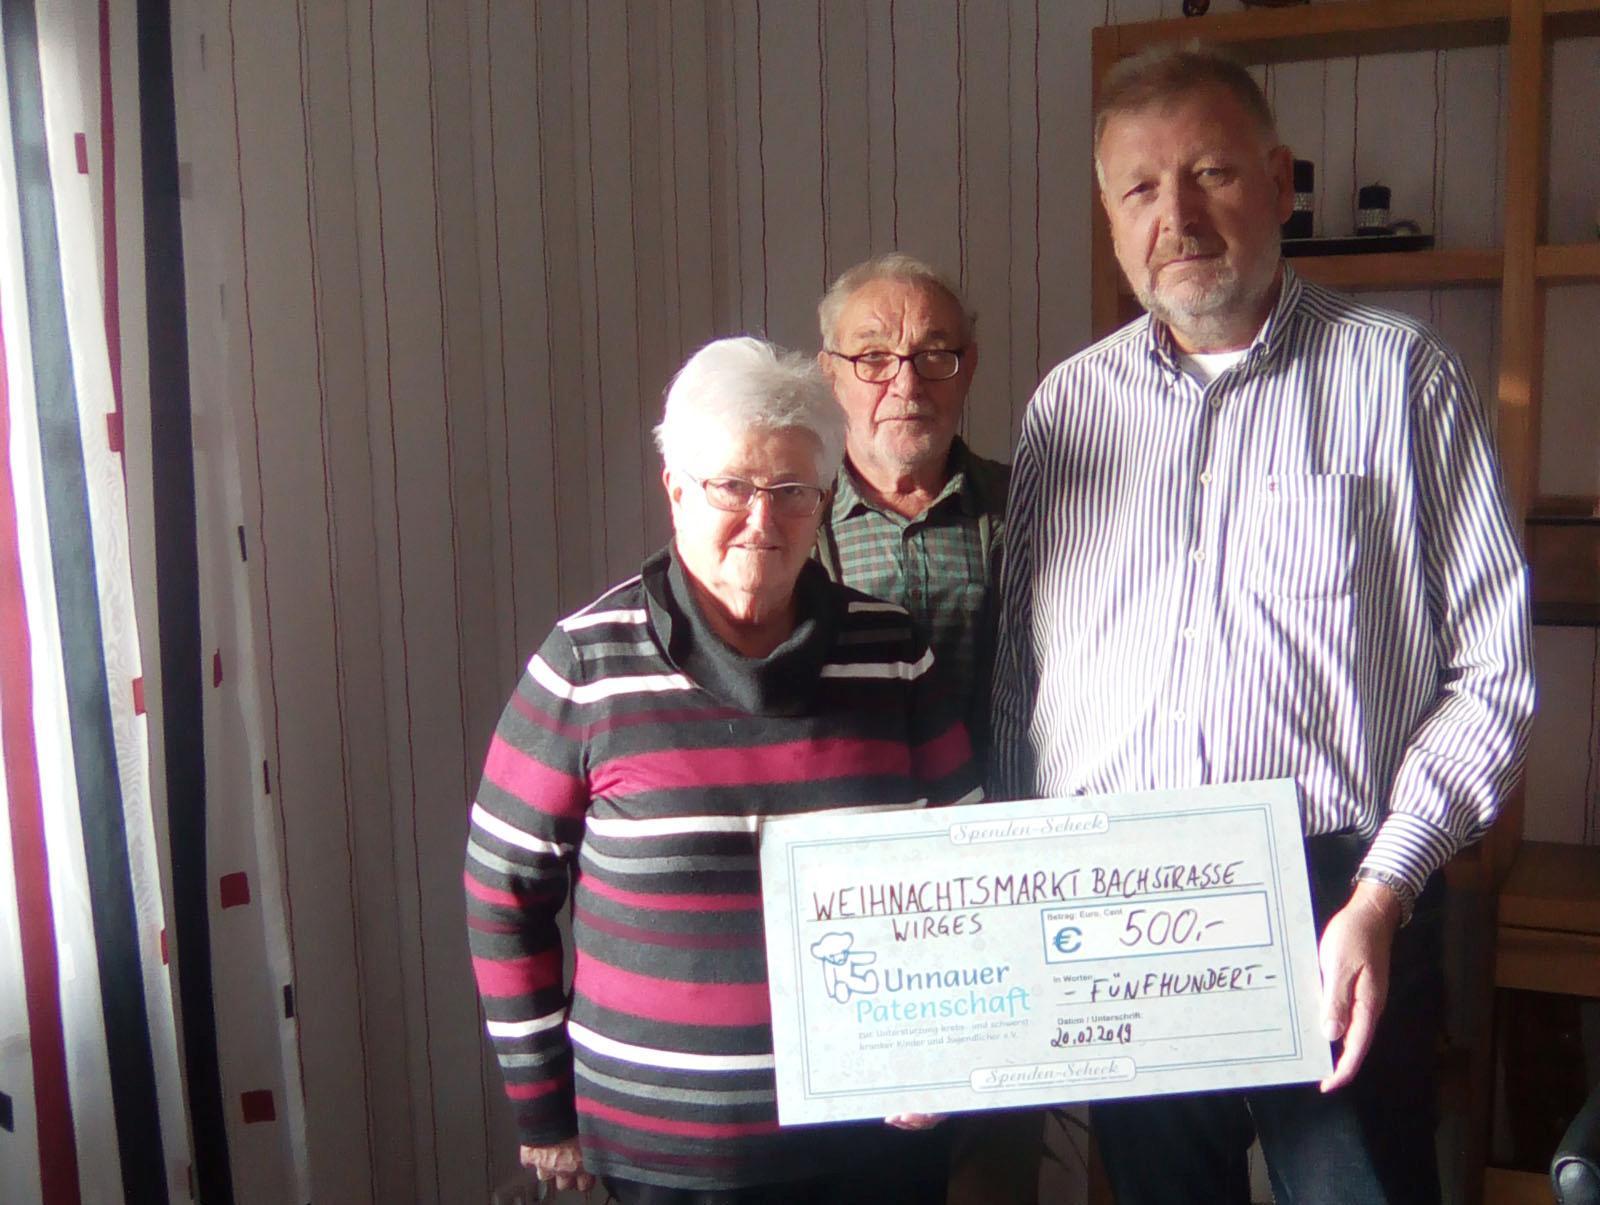 Bild der Spendenübergabe v.l. Peter Schmidt, Ursula Eller und Manfred Franz